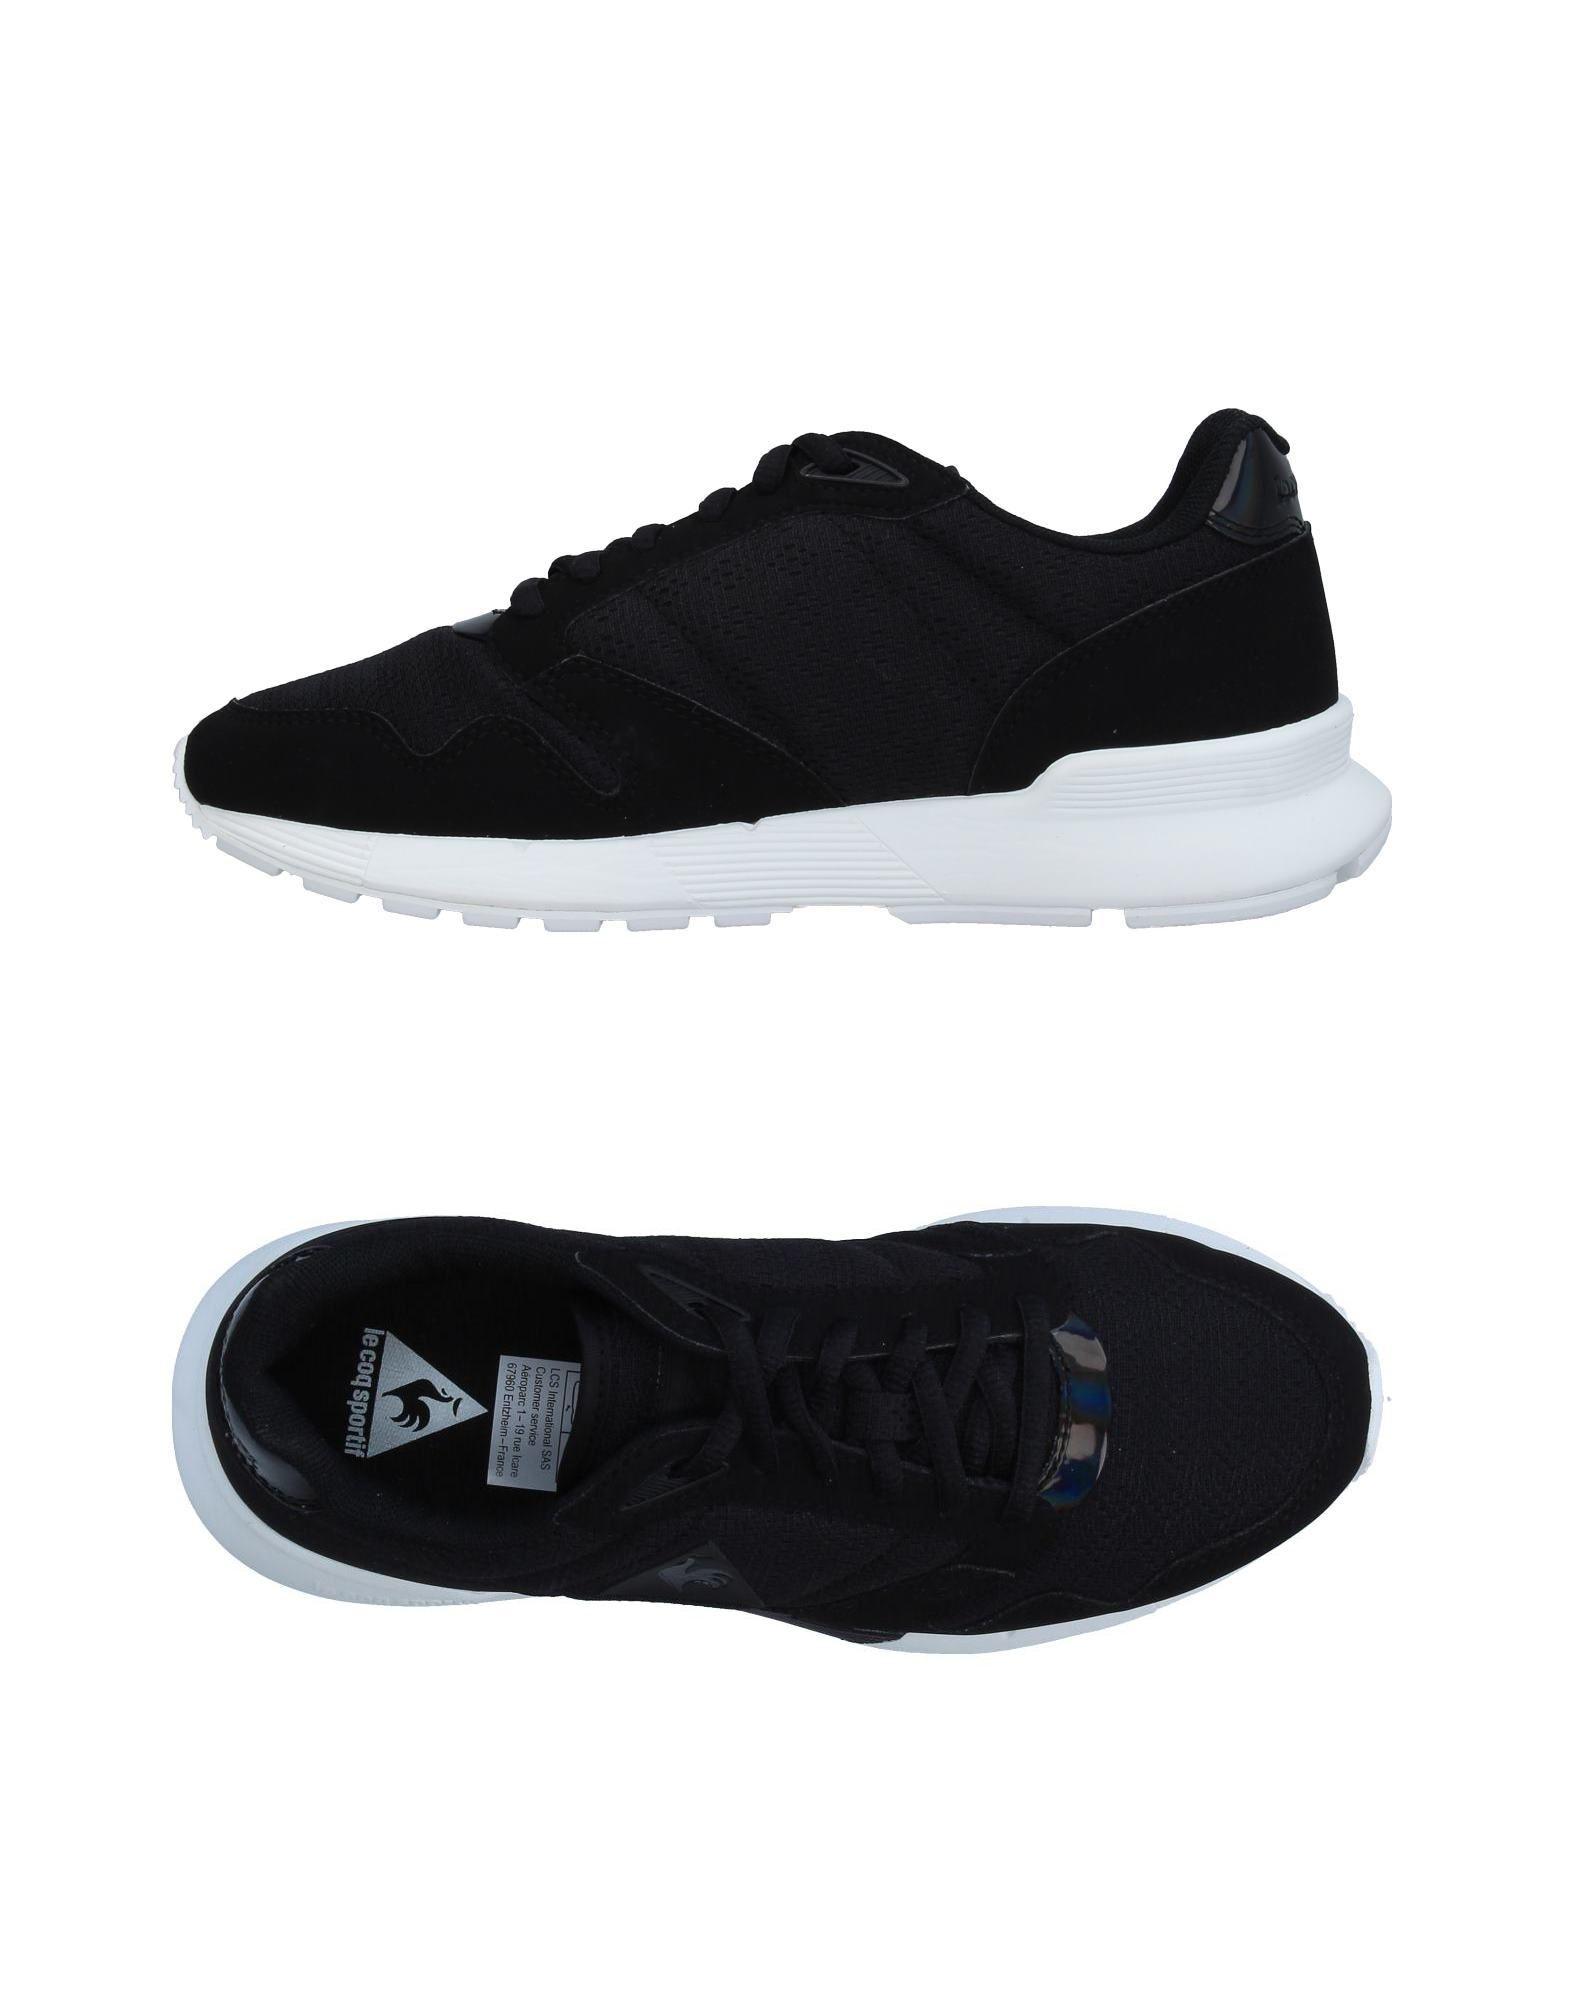 Sneakers Le Coq Sportif Donna - 11336700NV